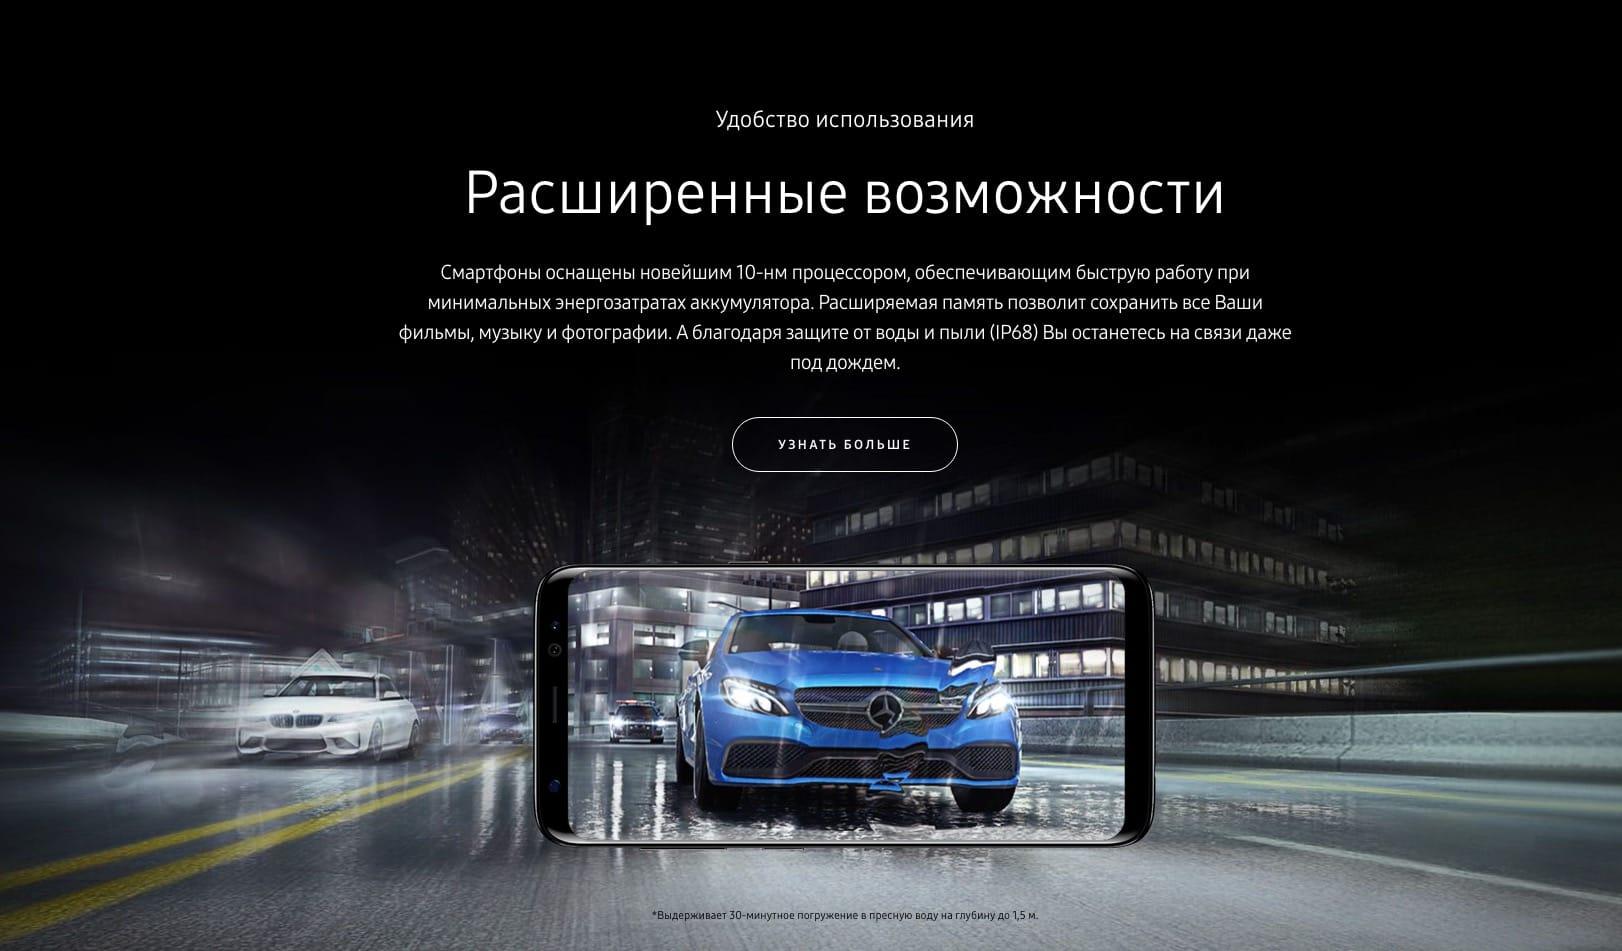 Samsung Galaxy S8 Russia Buy 2